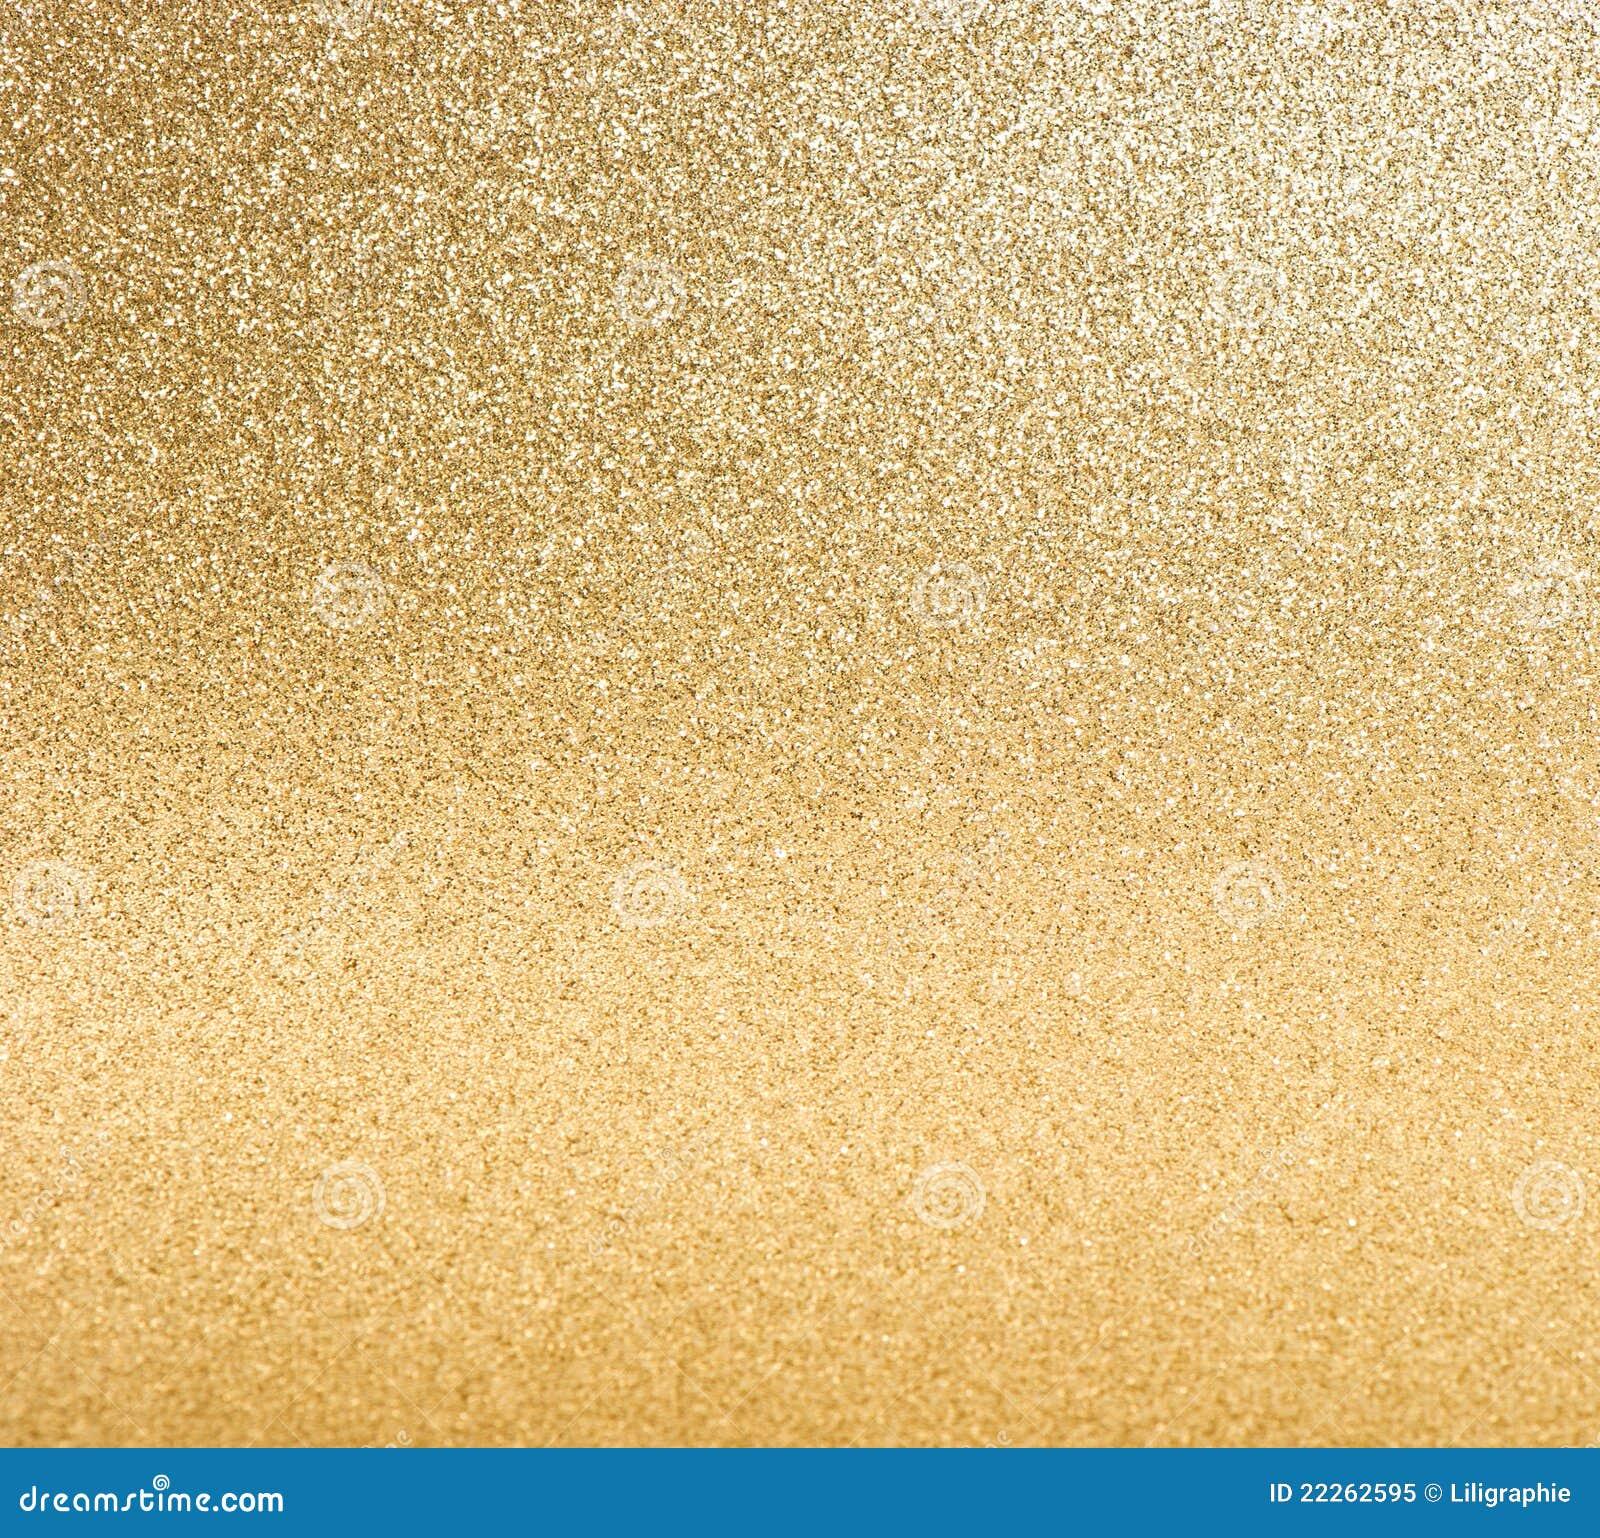 shiny golden lights stock - photo #31